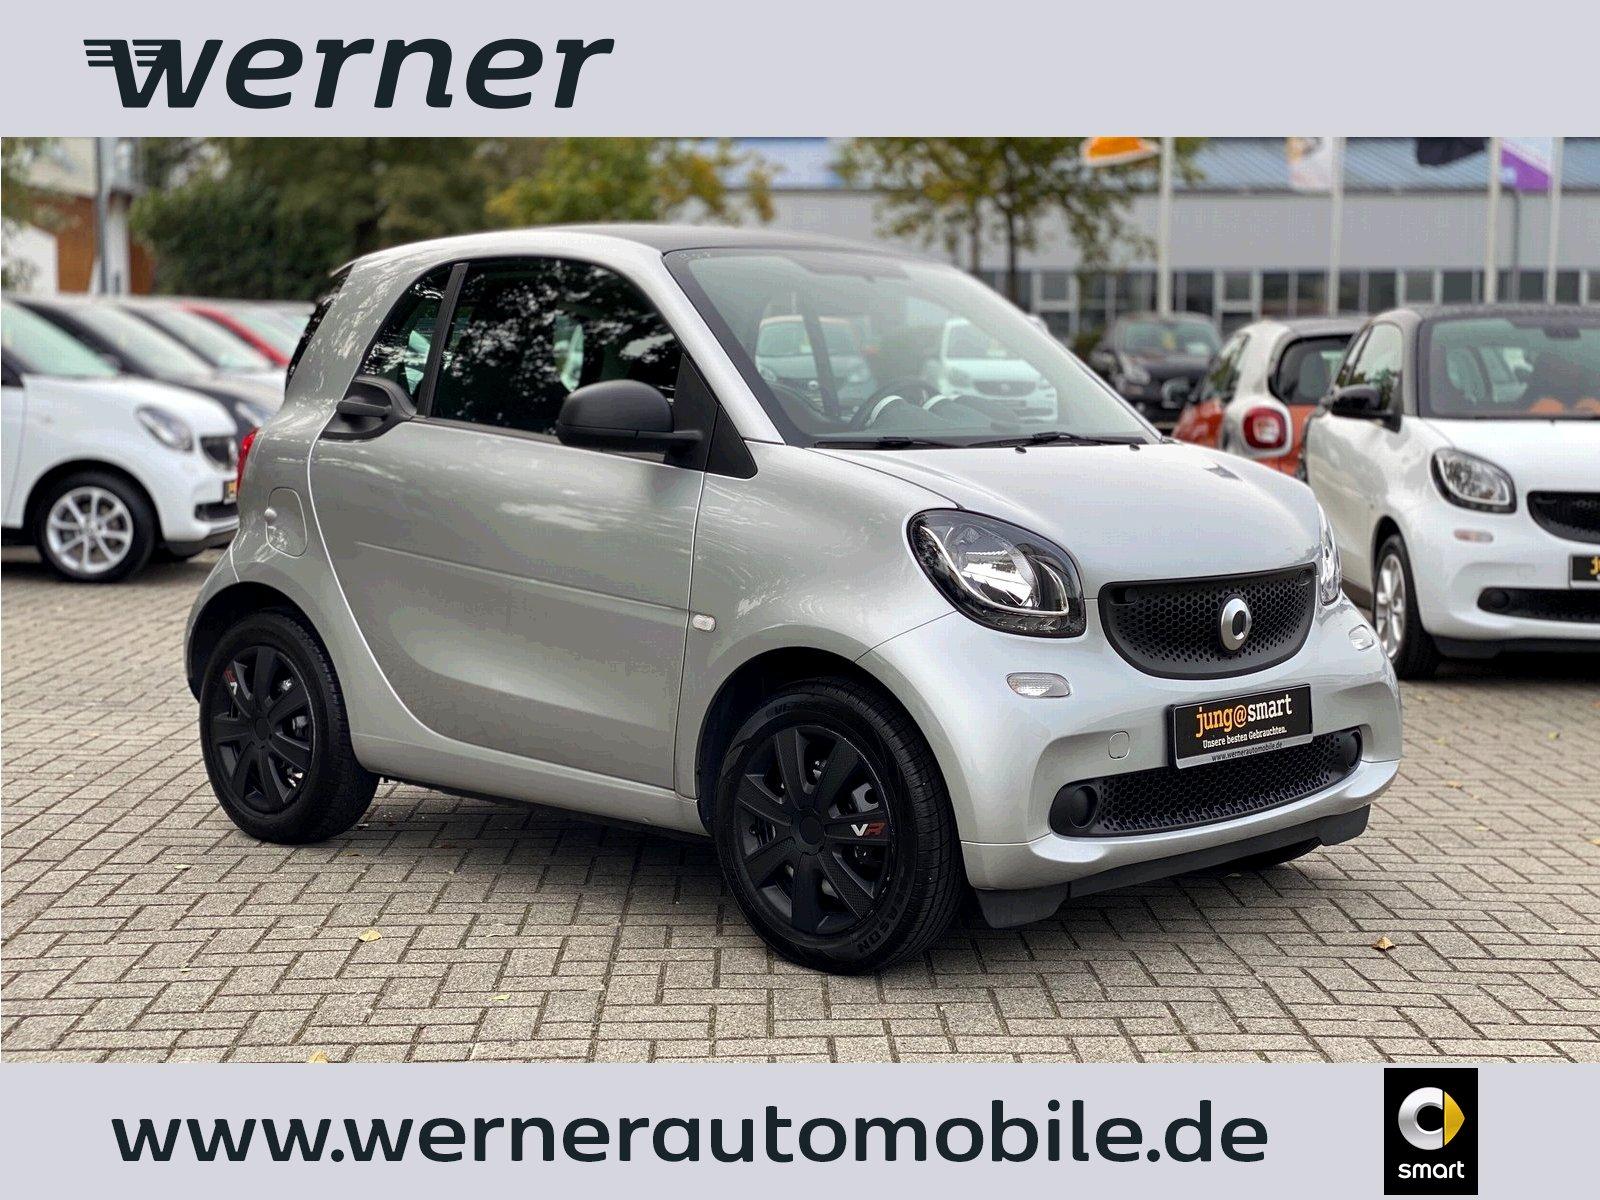 smart fortwo coupé 45 kW ~SERVO~ZV~JUNG@SMART~, Jahr 2016, Benzin